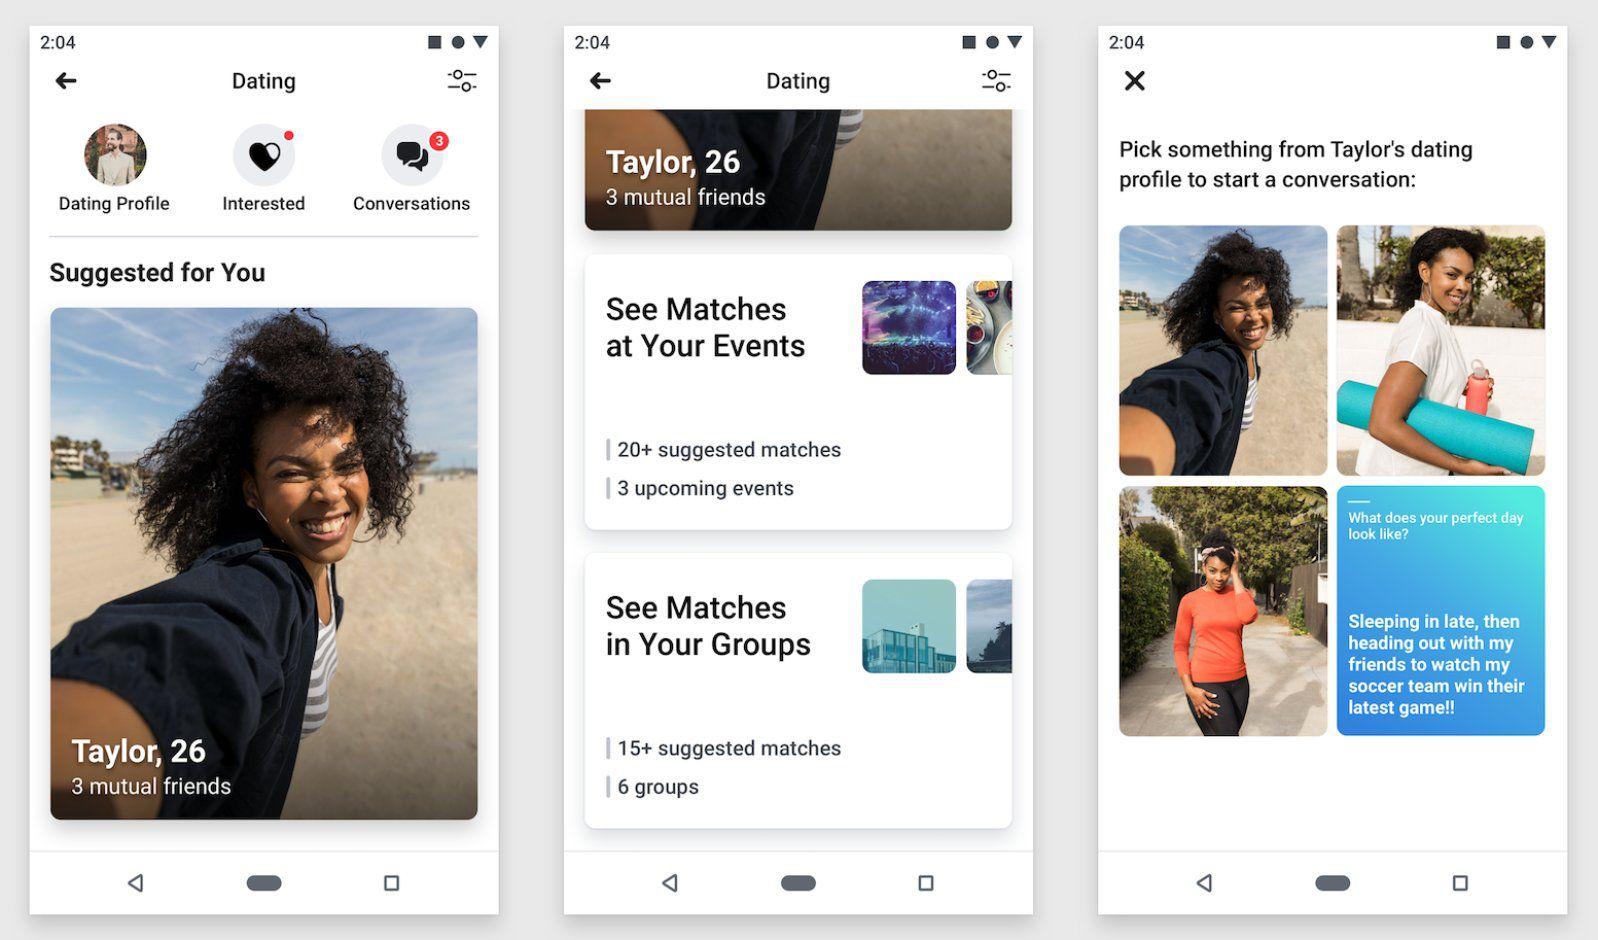 Facebook Rencontres : L'application de dating arrive en France